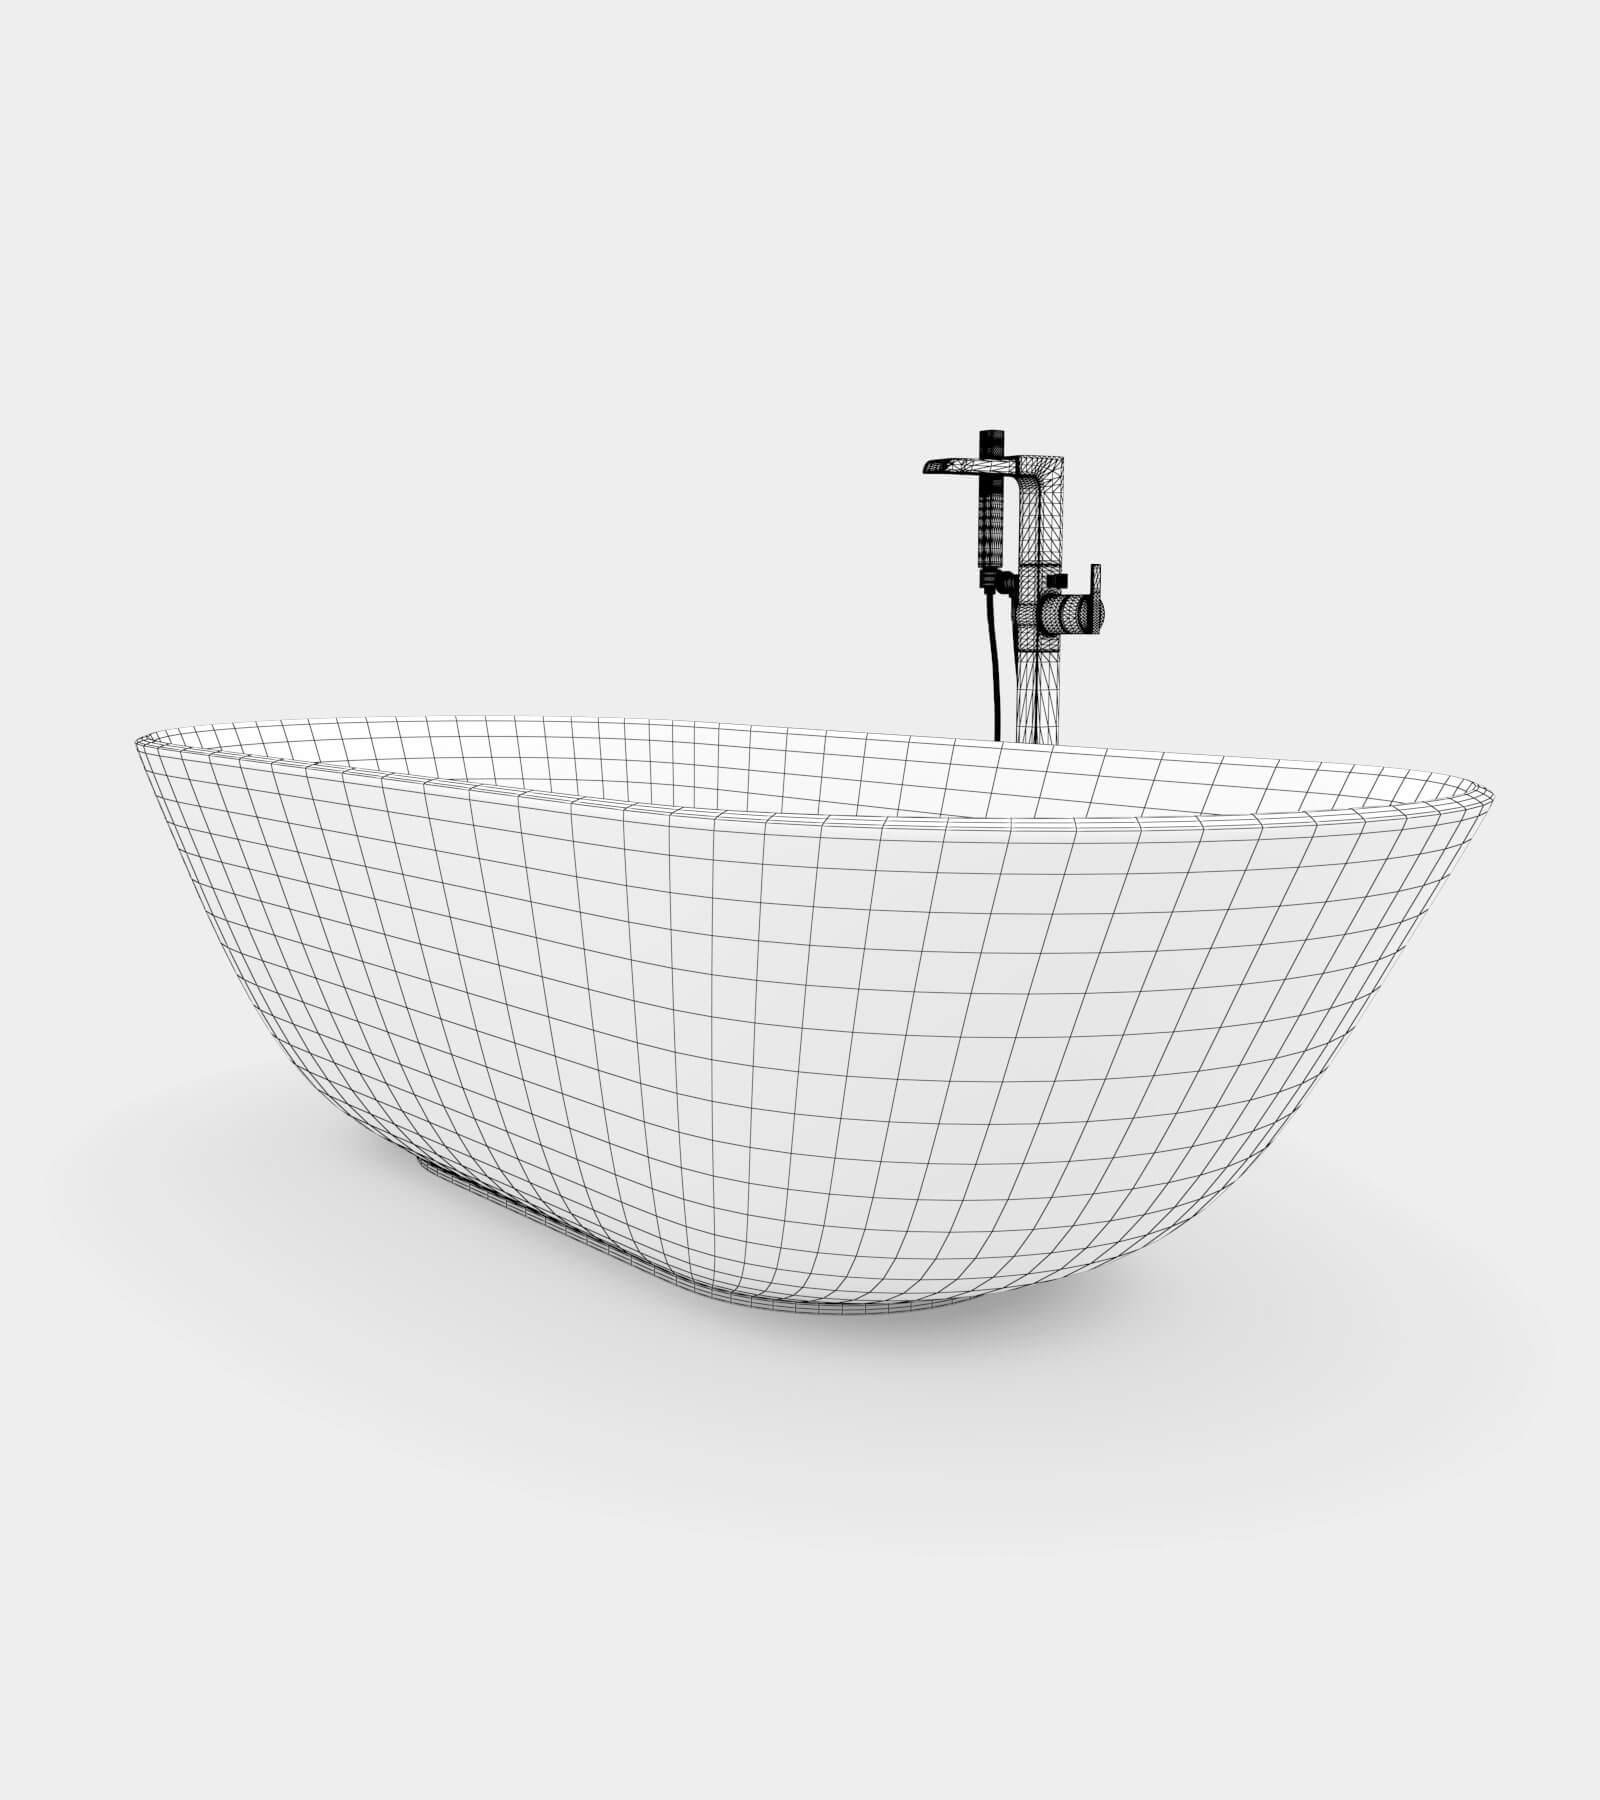 Bathroom Set 1 - 2 wire 3D Model